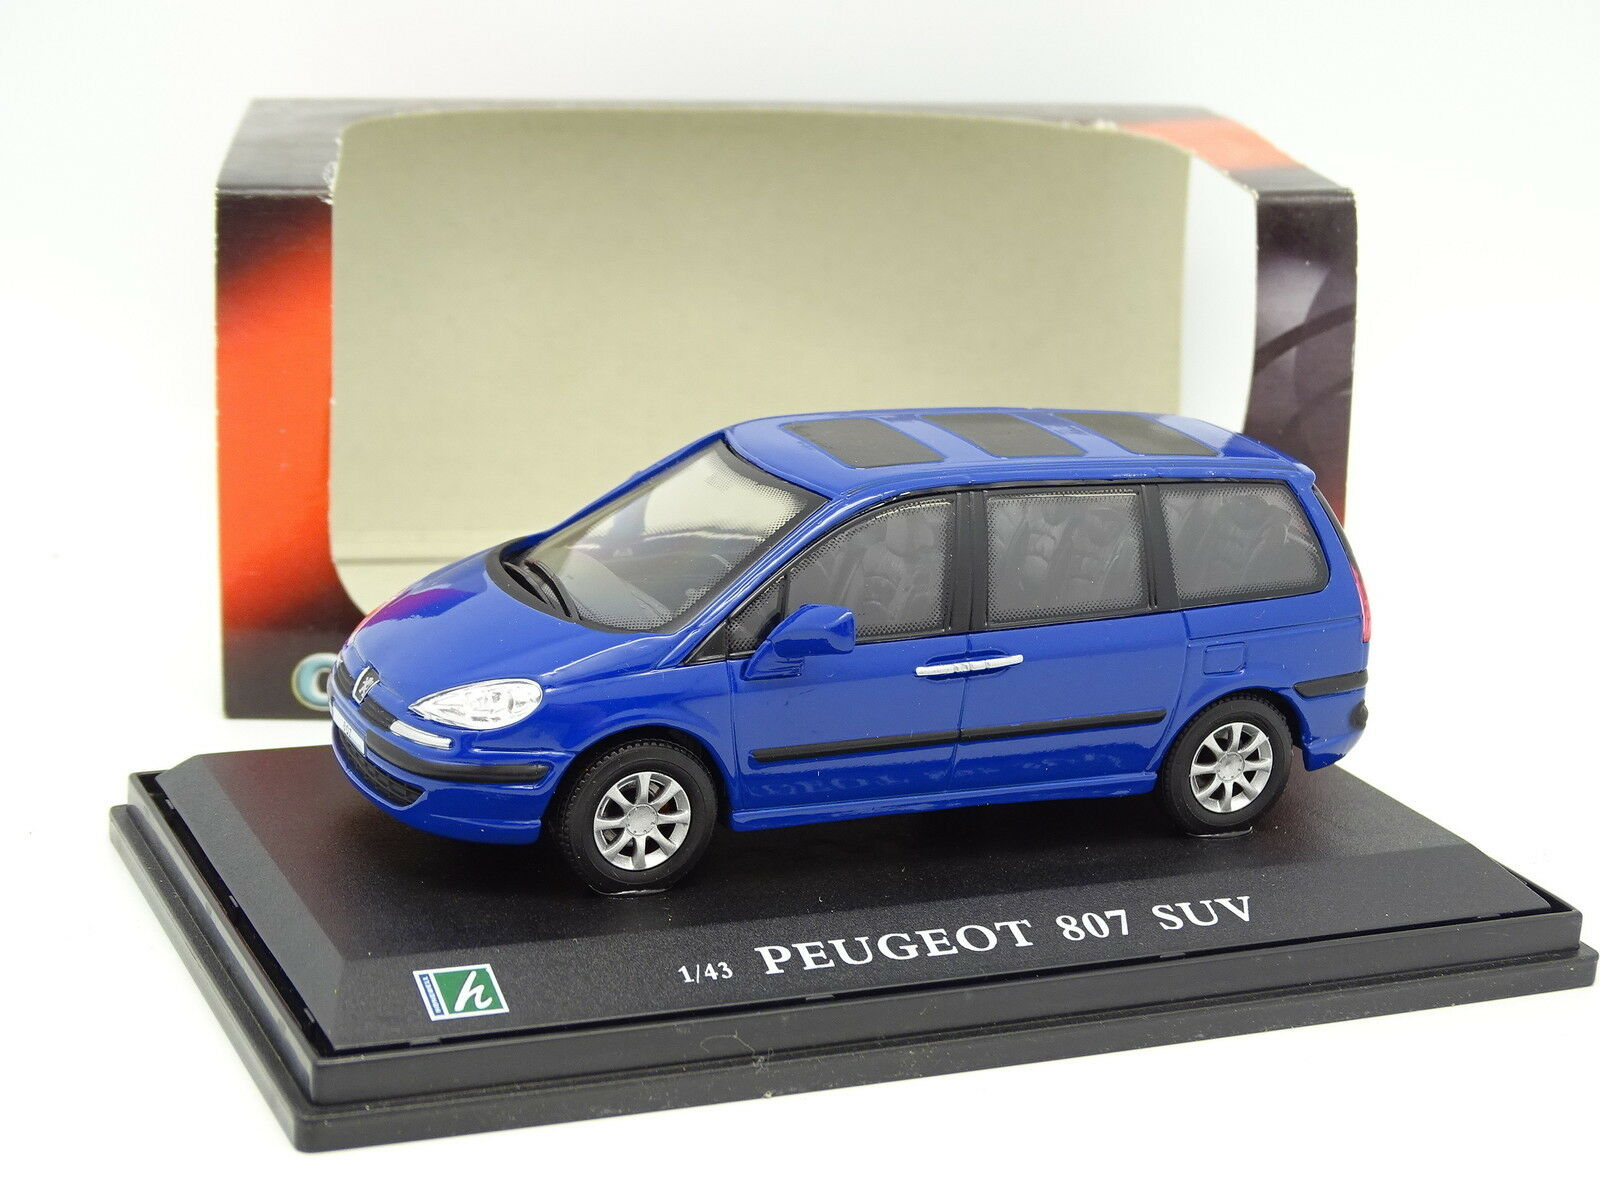 Cararama Oliex 1 43 - Peugeot 807 bluee